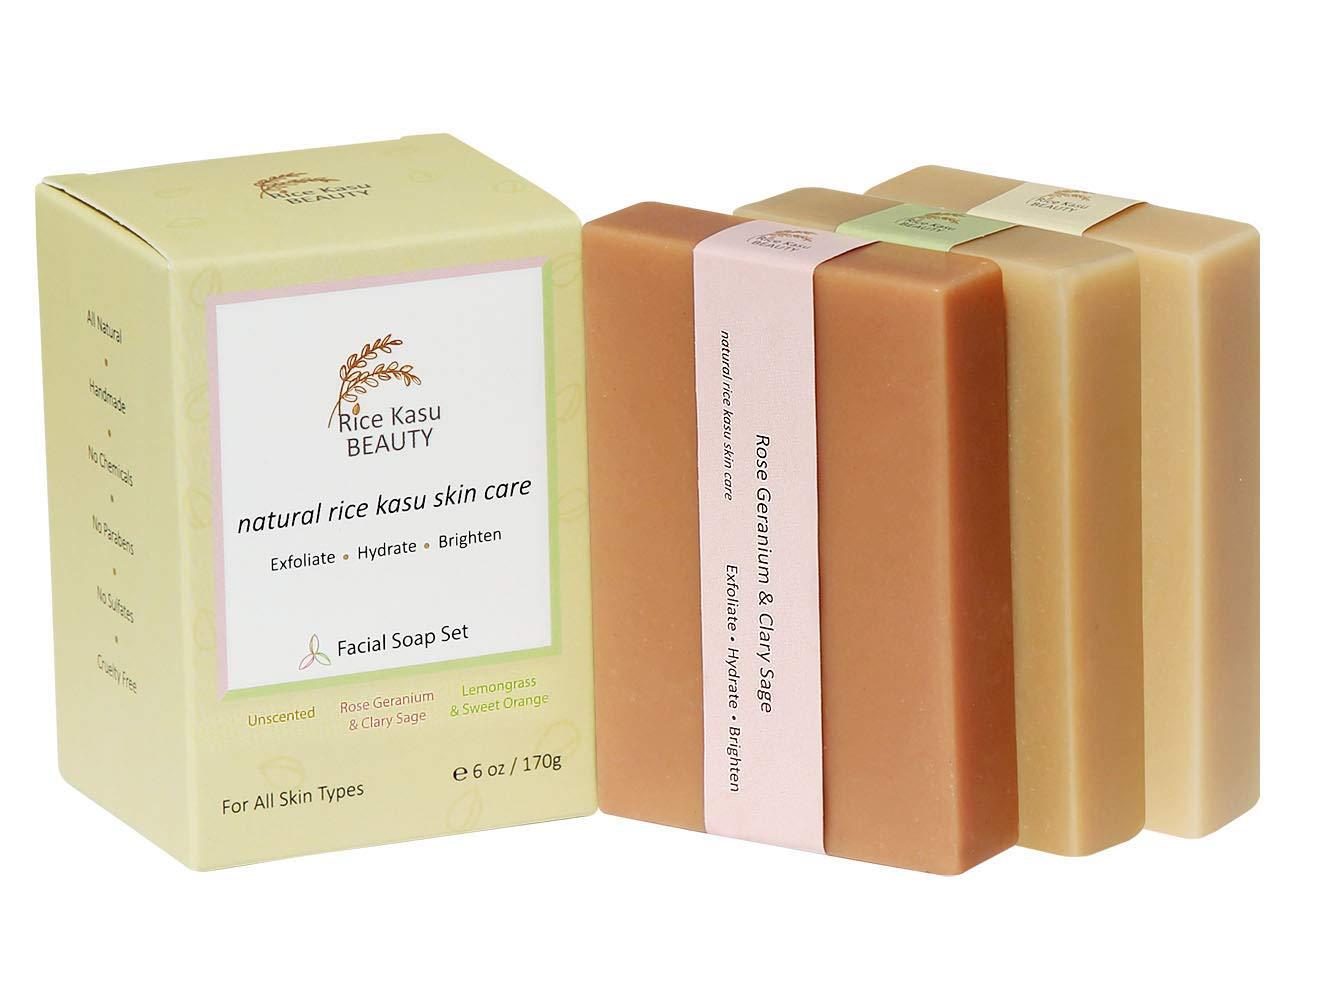 Rice Kasu Beauty 3-Piece Handmade Facial Soap Set, Unscented, Rose Geranium, Lemongrass and Sweet Orange, 6 Ounce